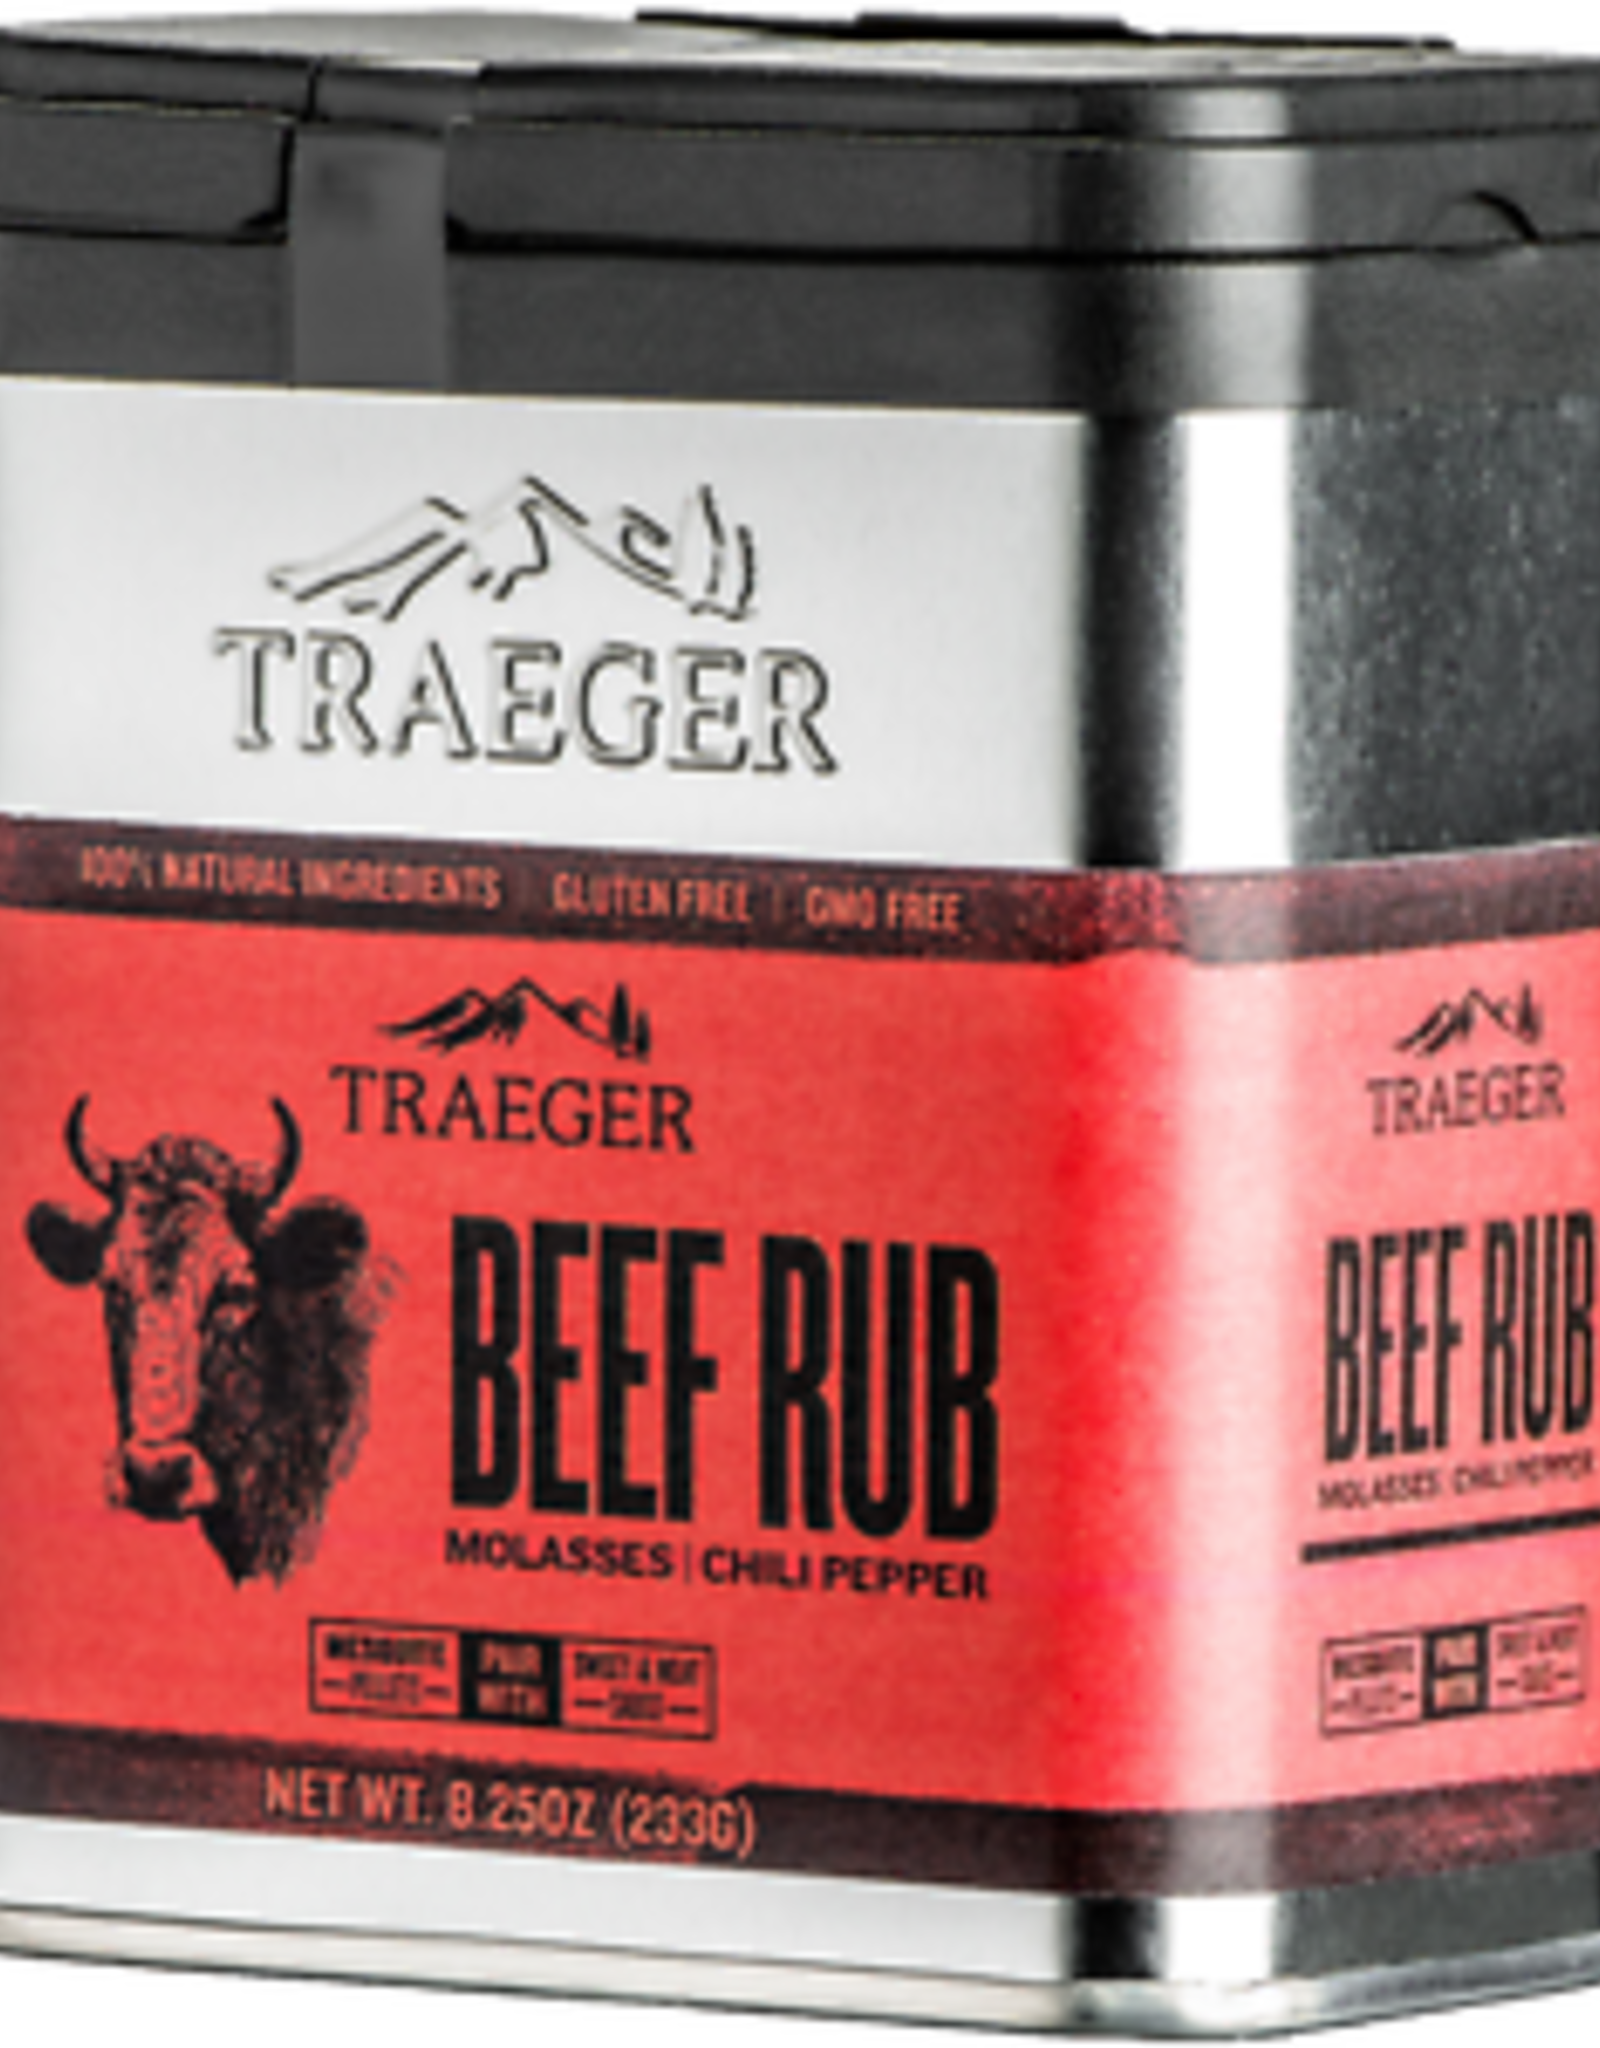 Traeger Traeger Beef Rub - SPC169